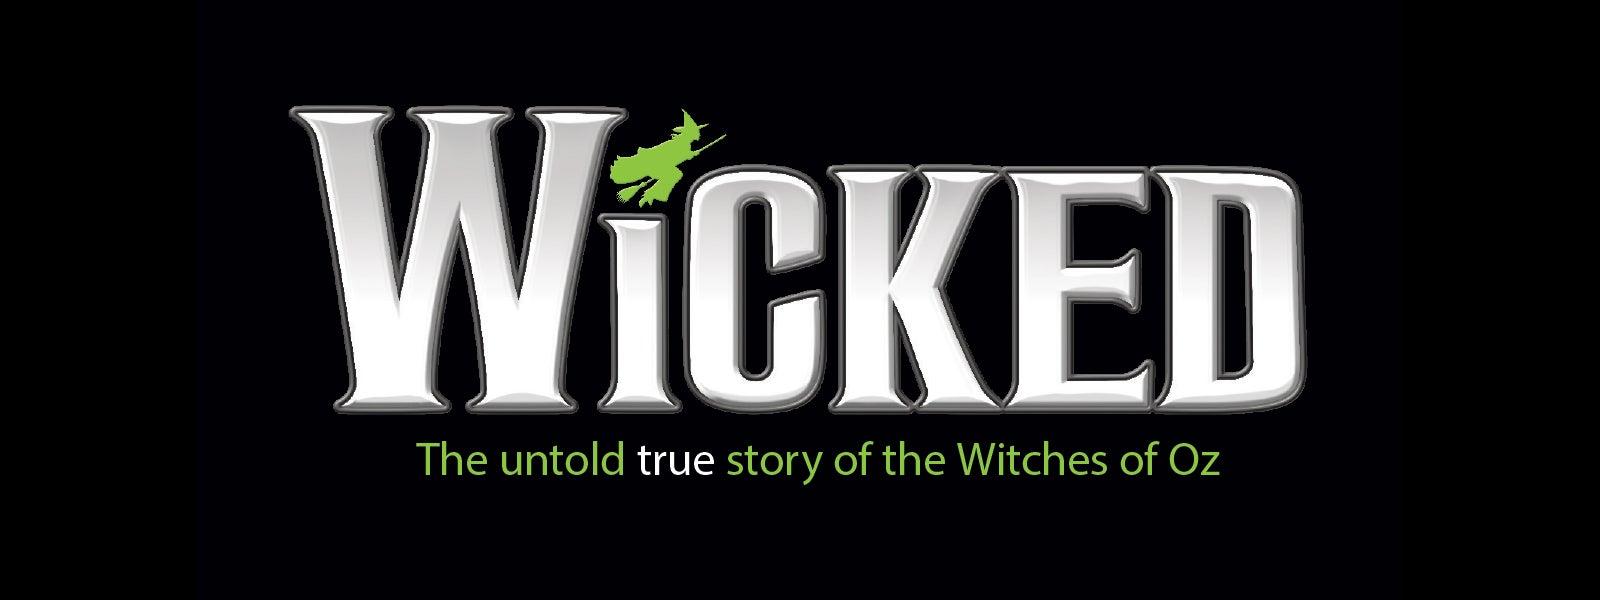 Wicked_1600x600_BRANDED.jpg